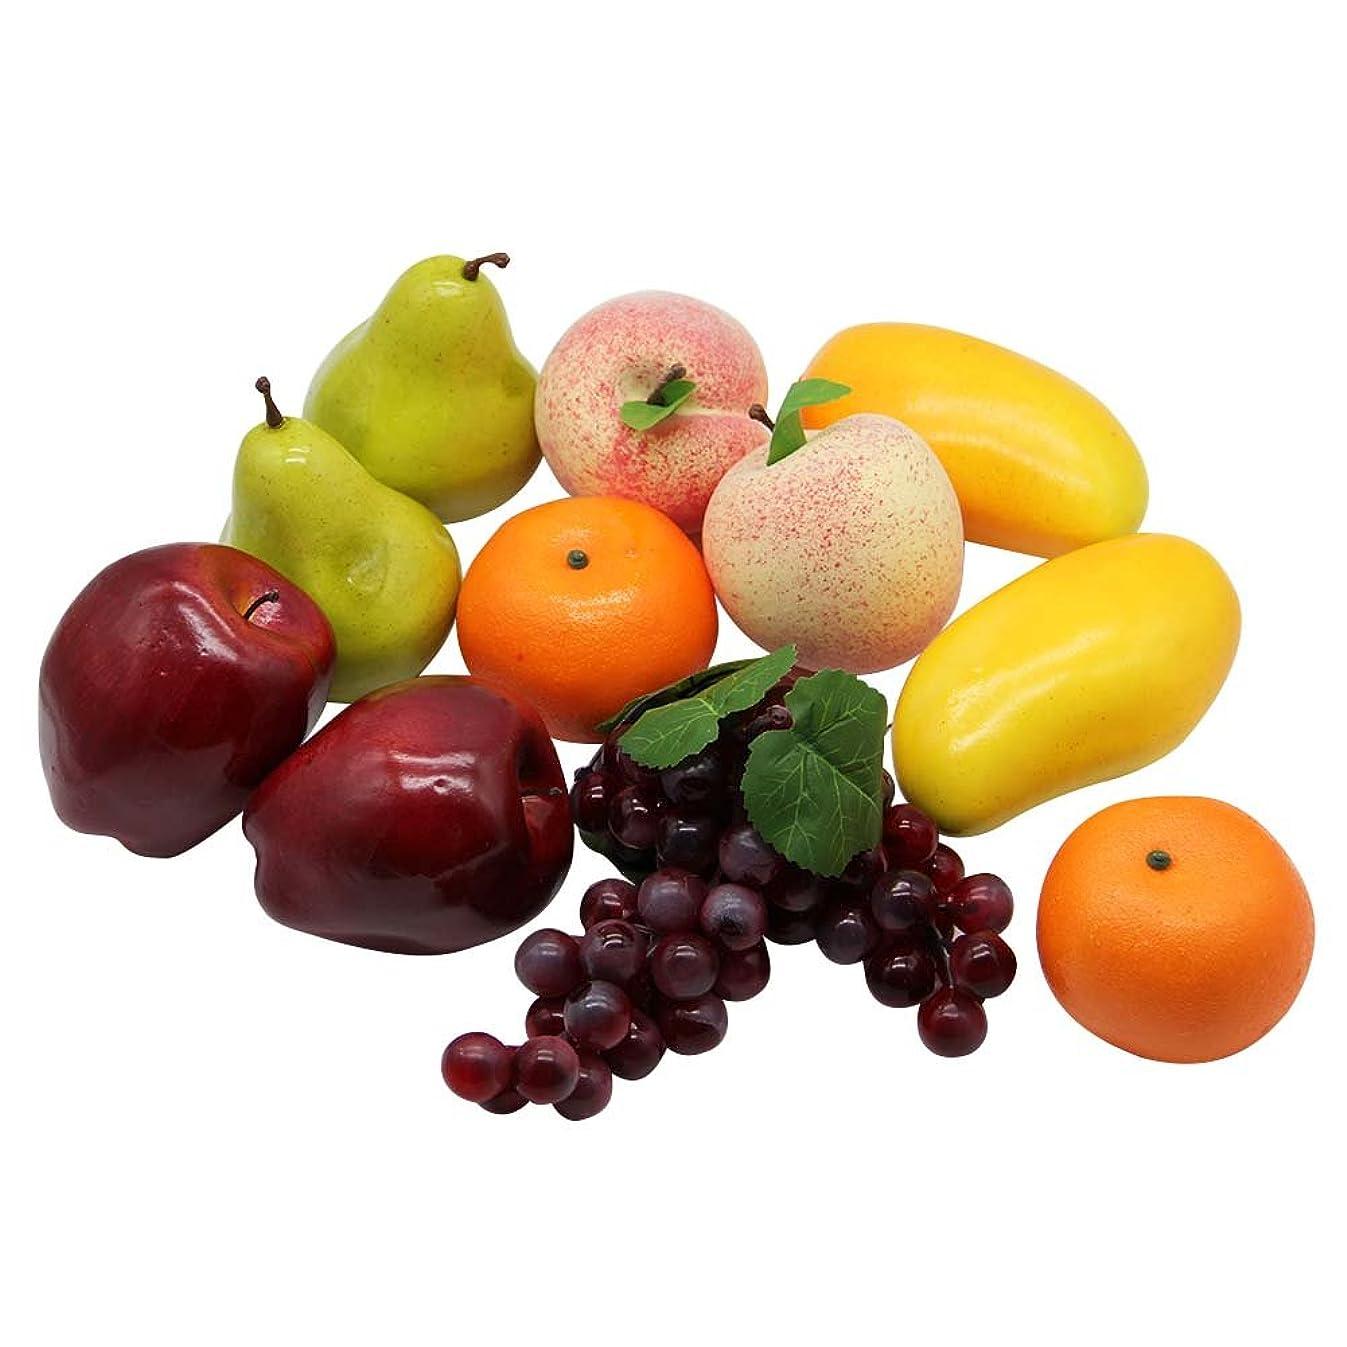 Decorative Lifelike Realistic Artificial Fake Fruit Decor (Set of 12)